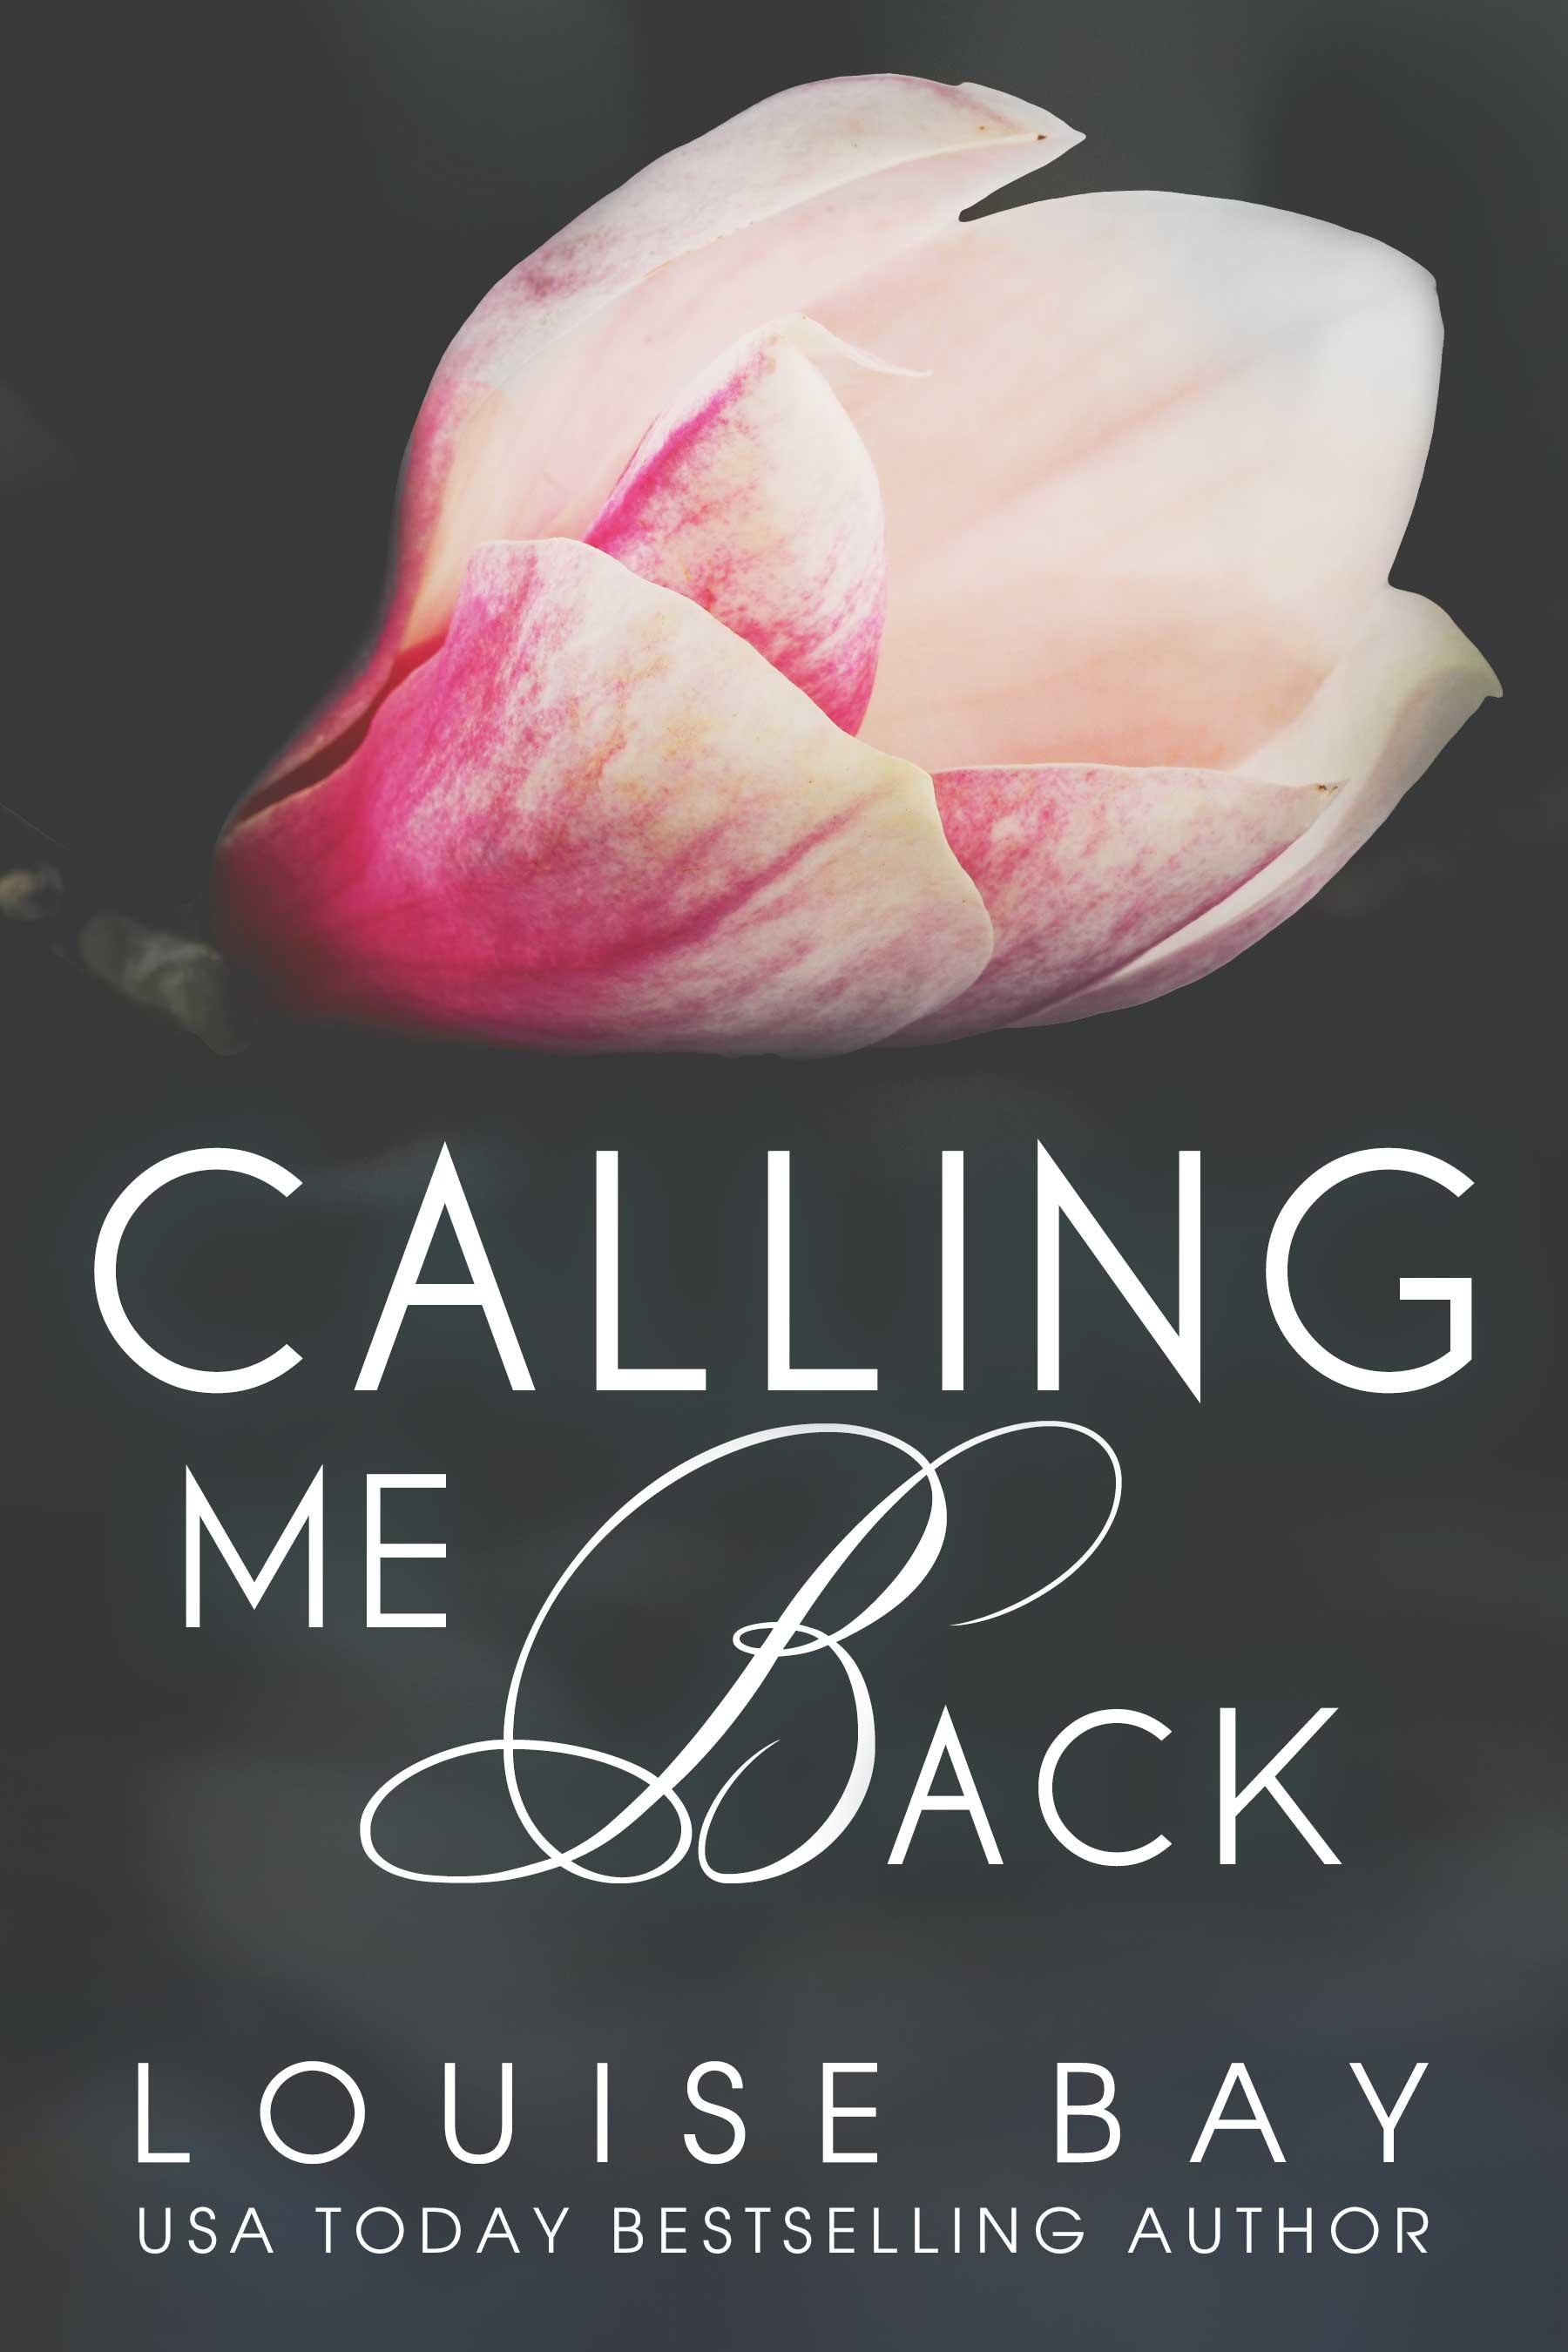 Calling Me Back